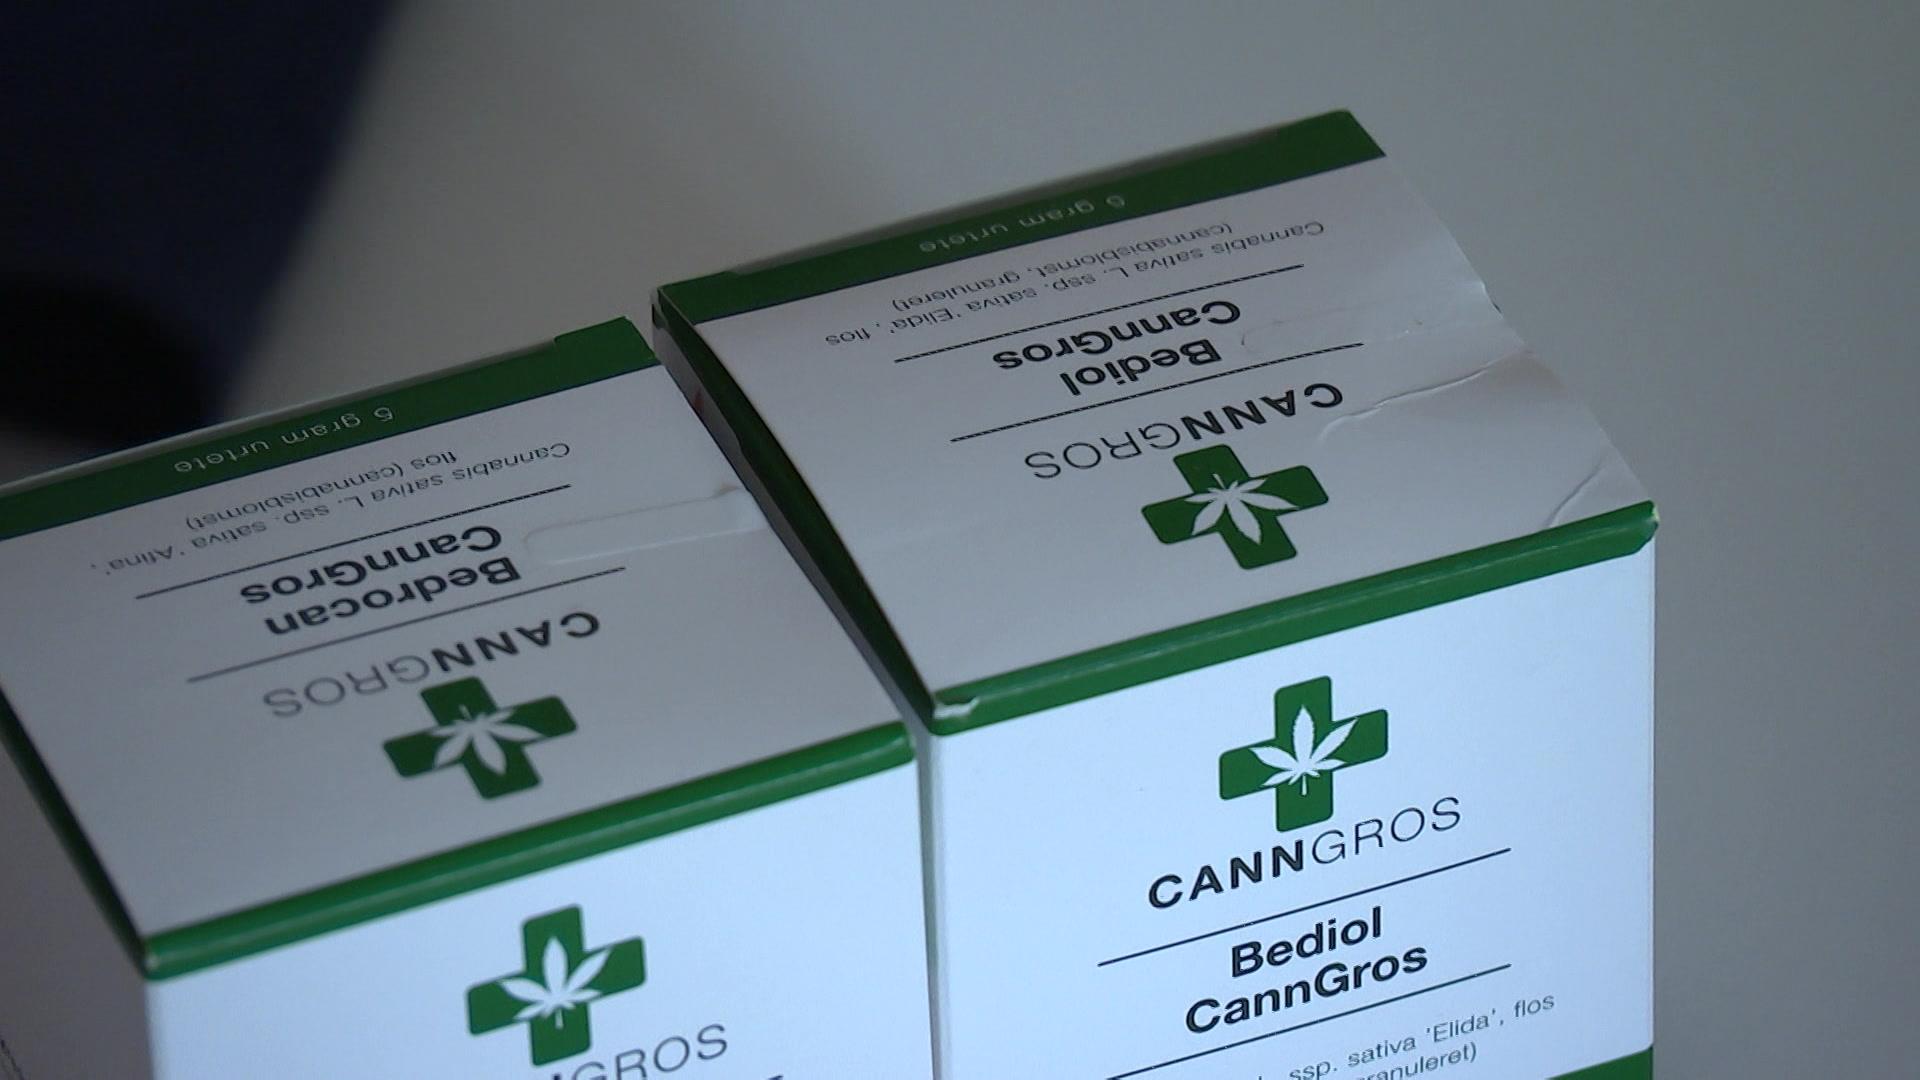 9675899_liqu_sekvens_indland_medicinsk_cannabis_case_hq-00.16.15.13_0.jpg